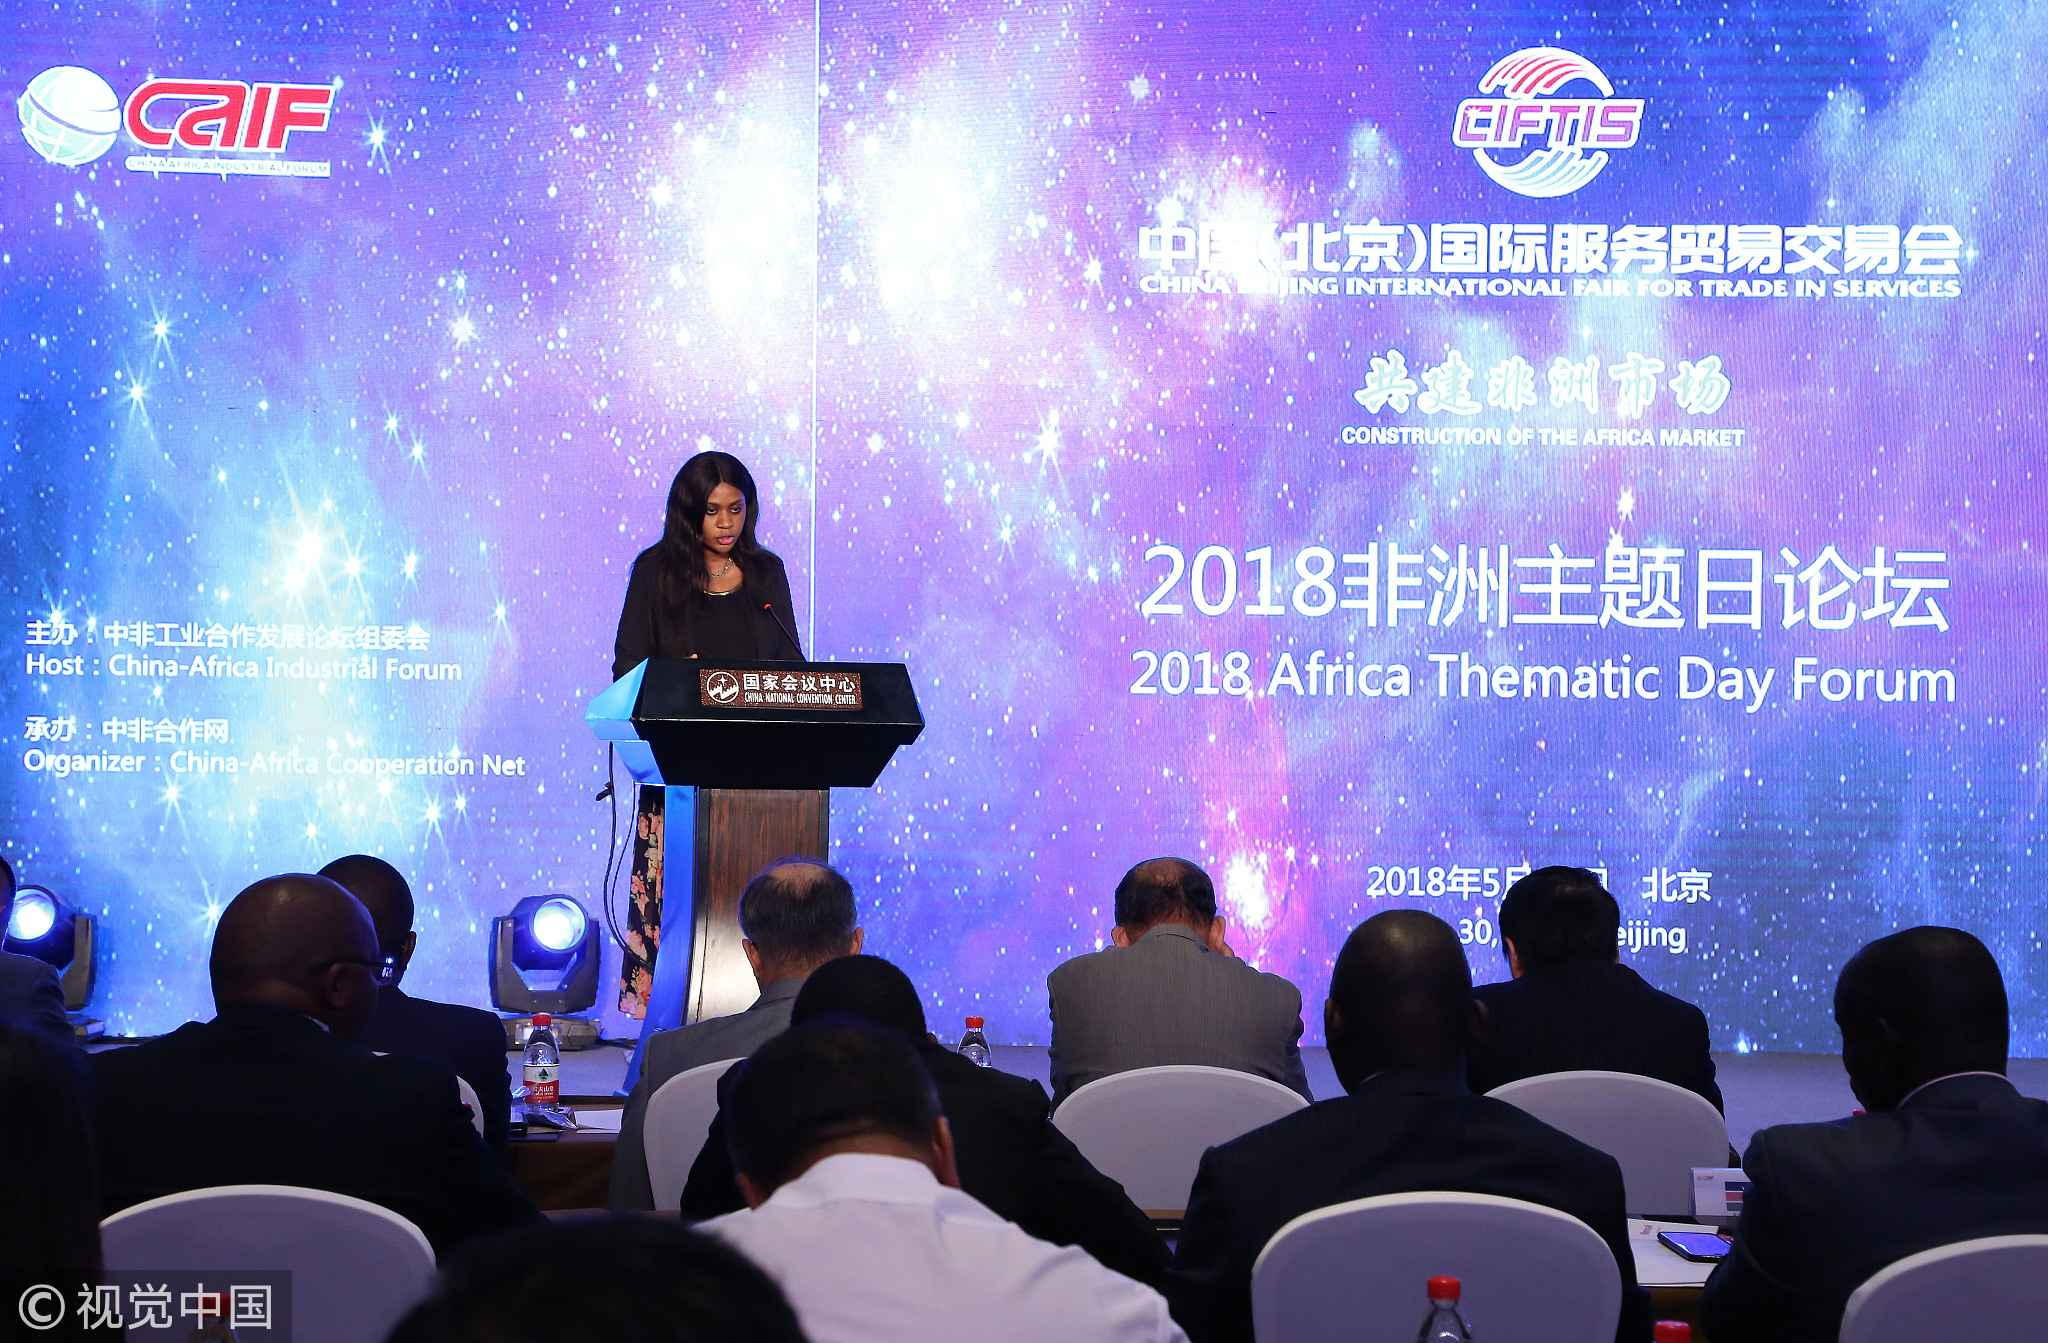 CGTN Opinion: Market logic made China successful in Africa